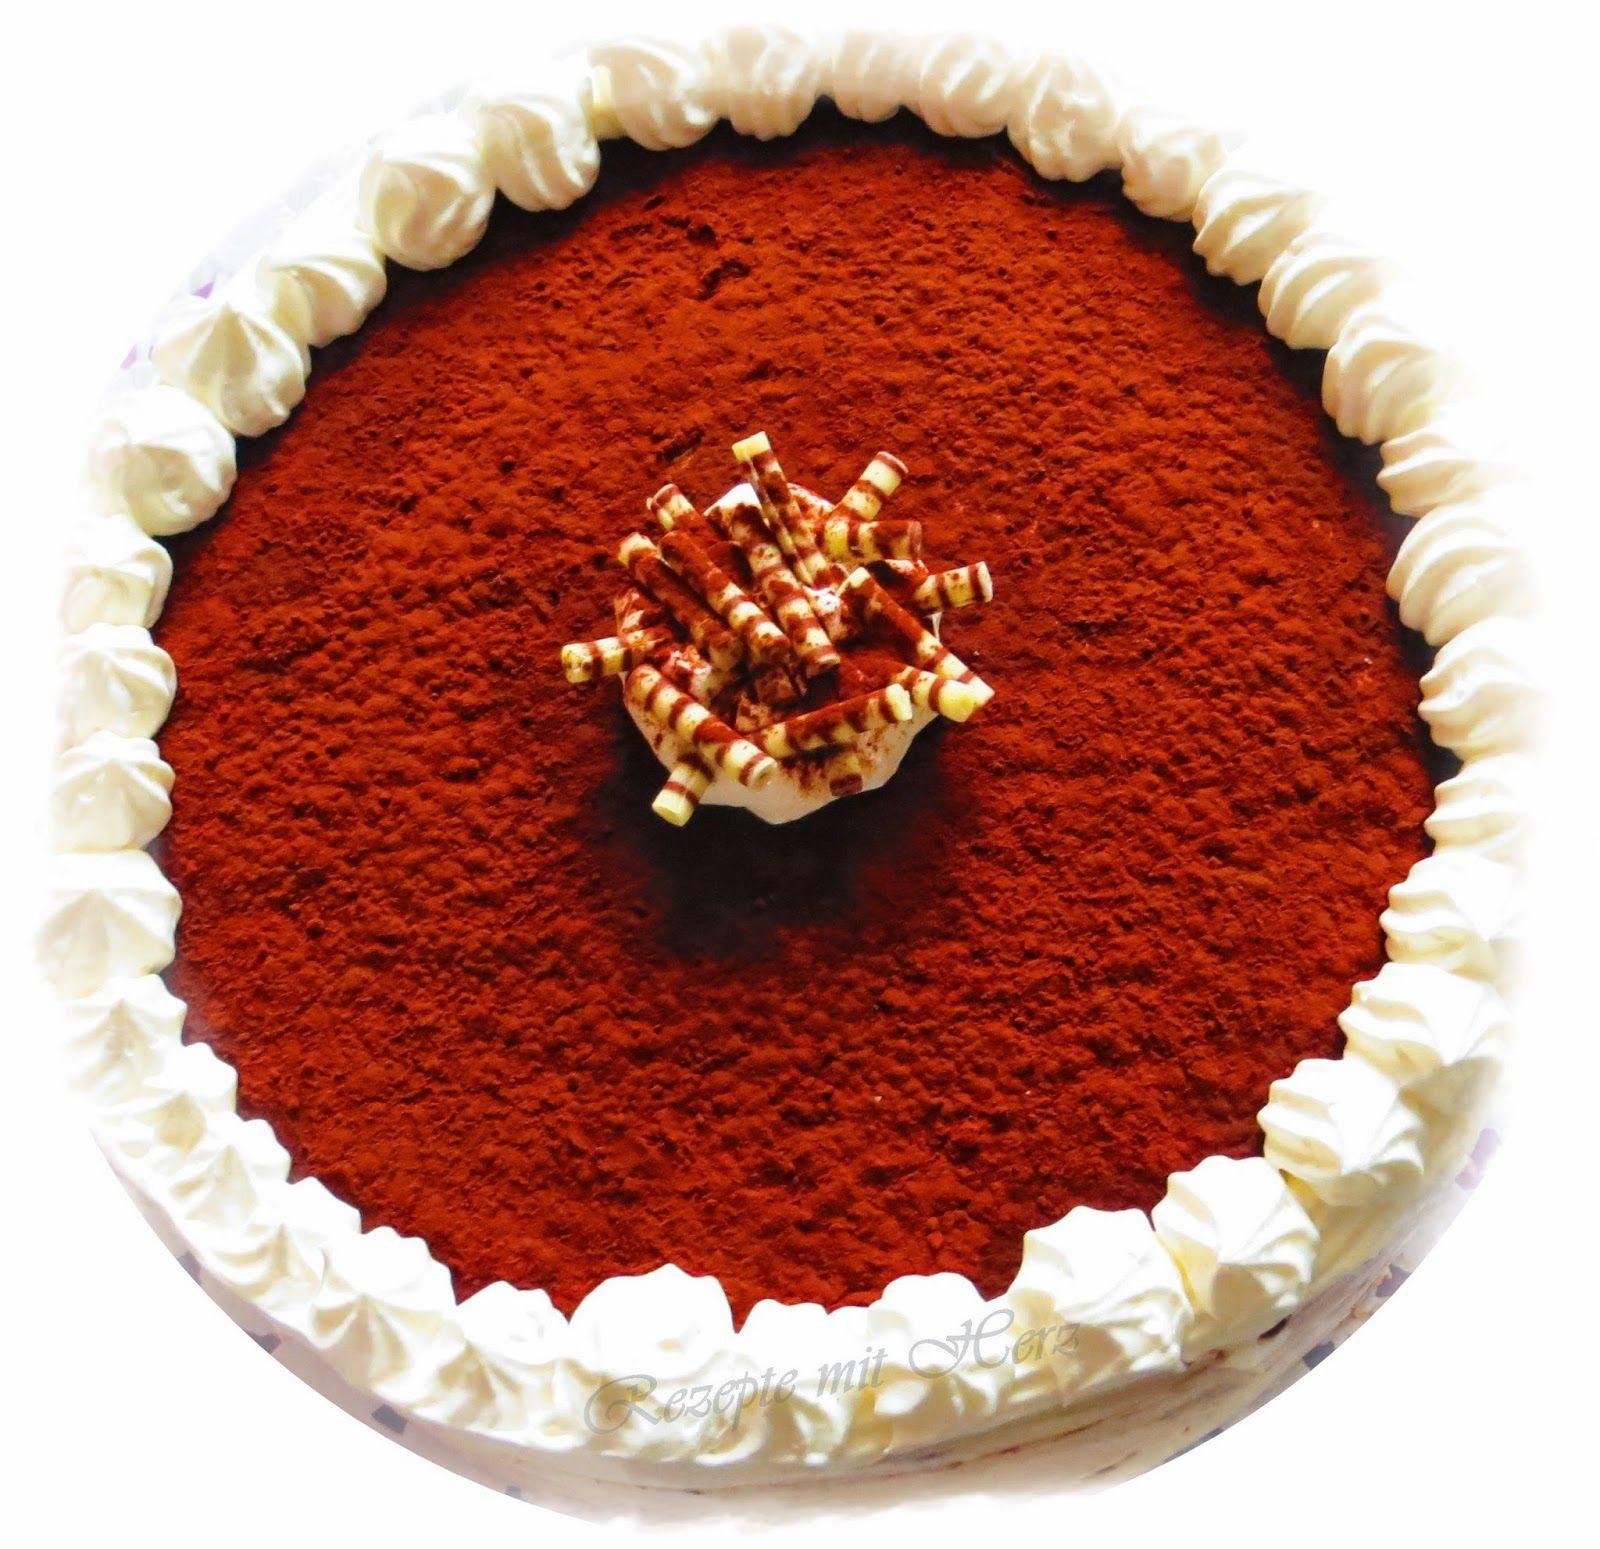 Thermomix Rezepte mit Herz Tiramisu Torte